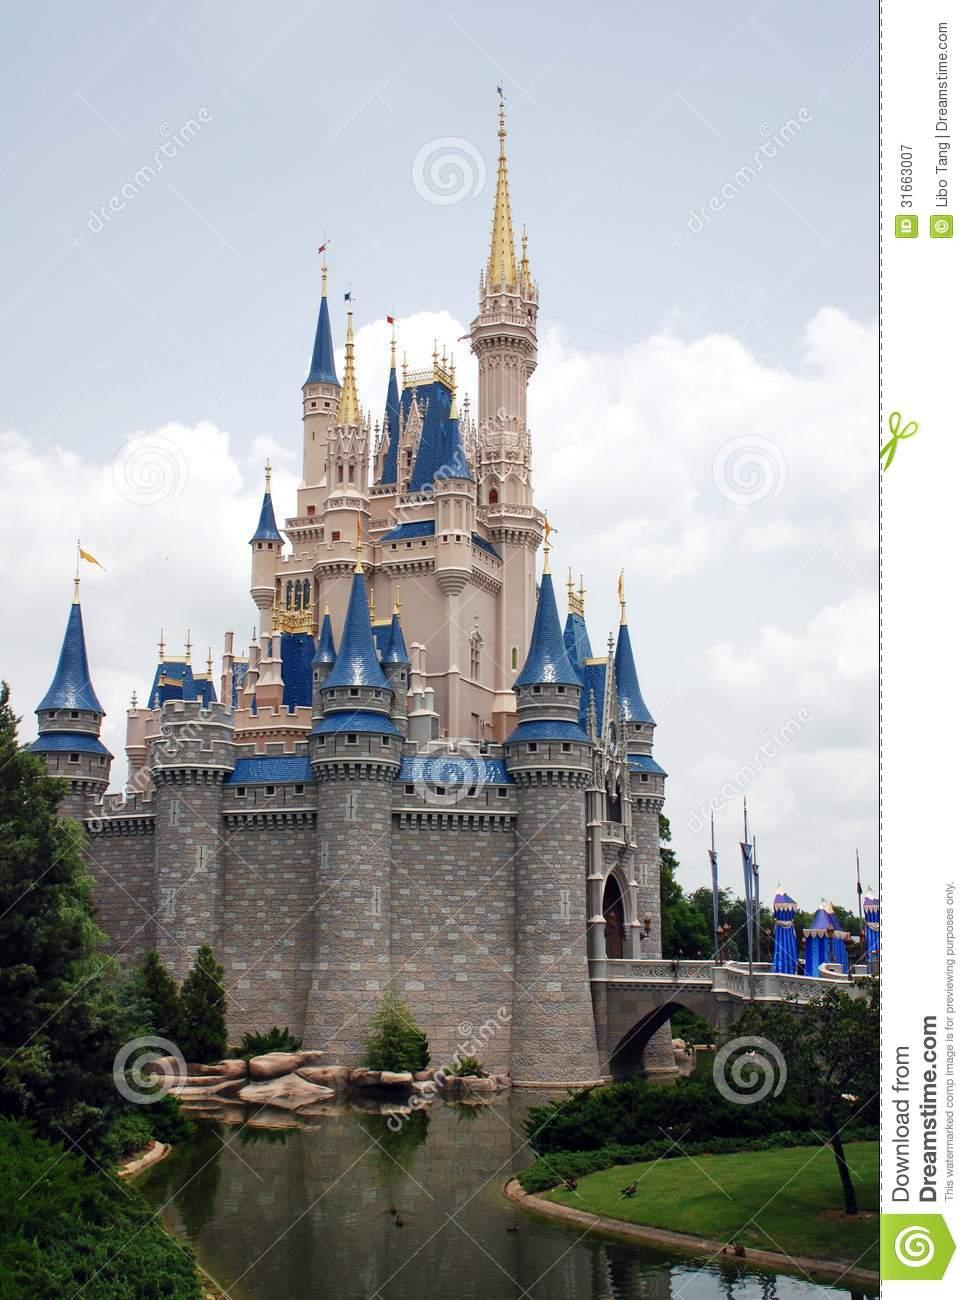 Magic kingdom disney world clipart clipart library stock Disney world magic kingdom clipart - ClipartFest clipart library stock